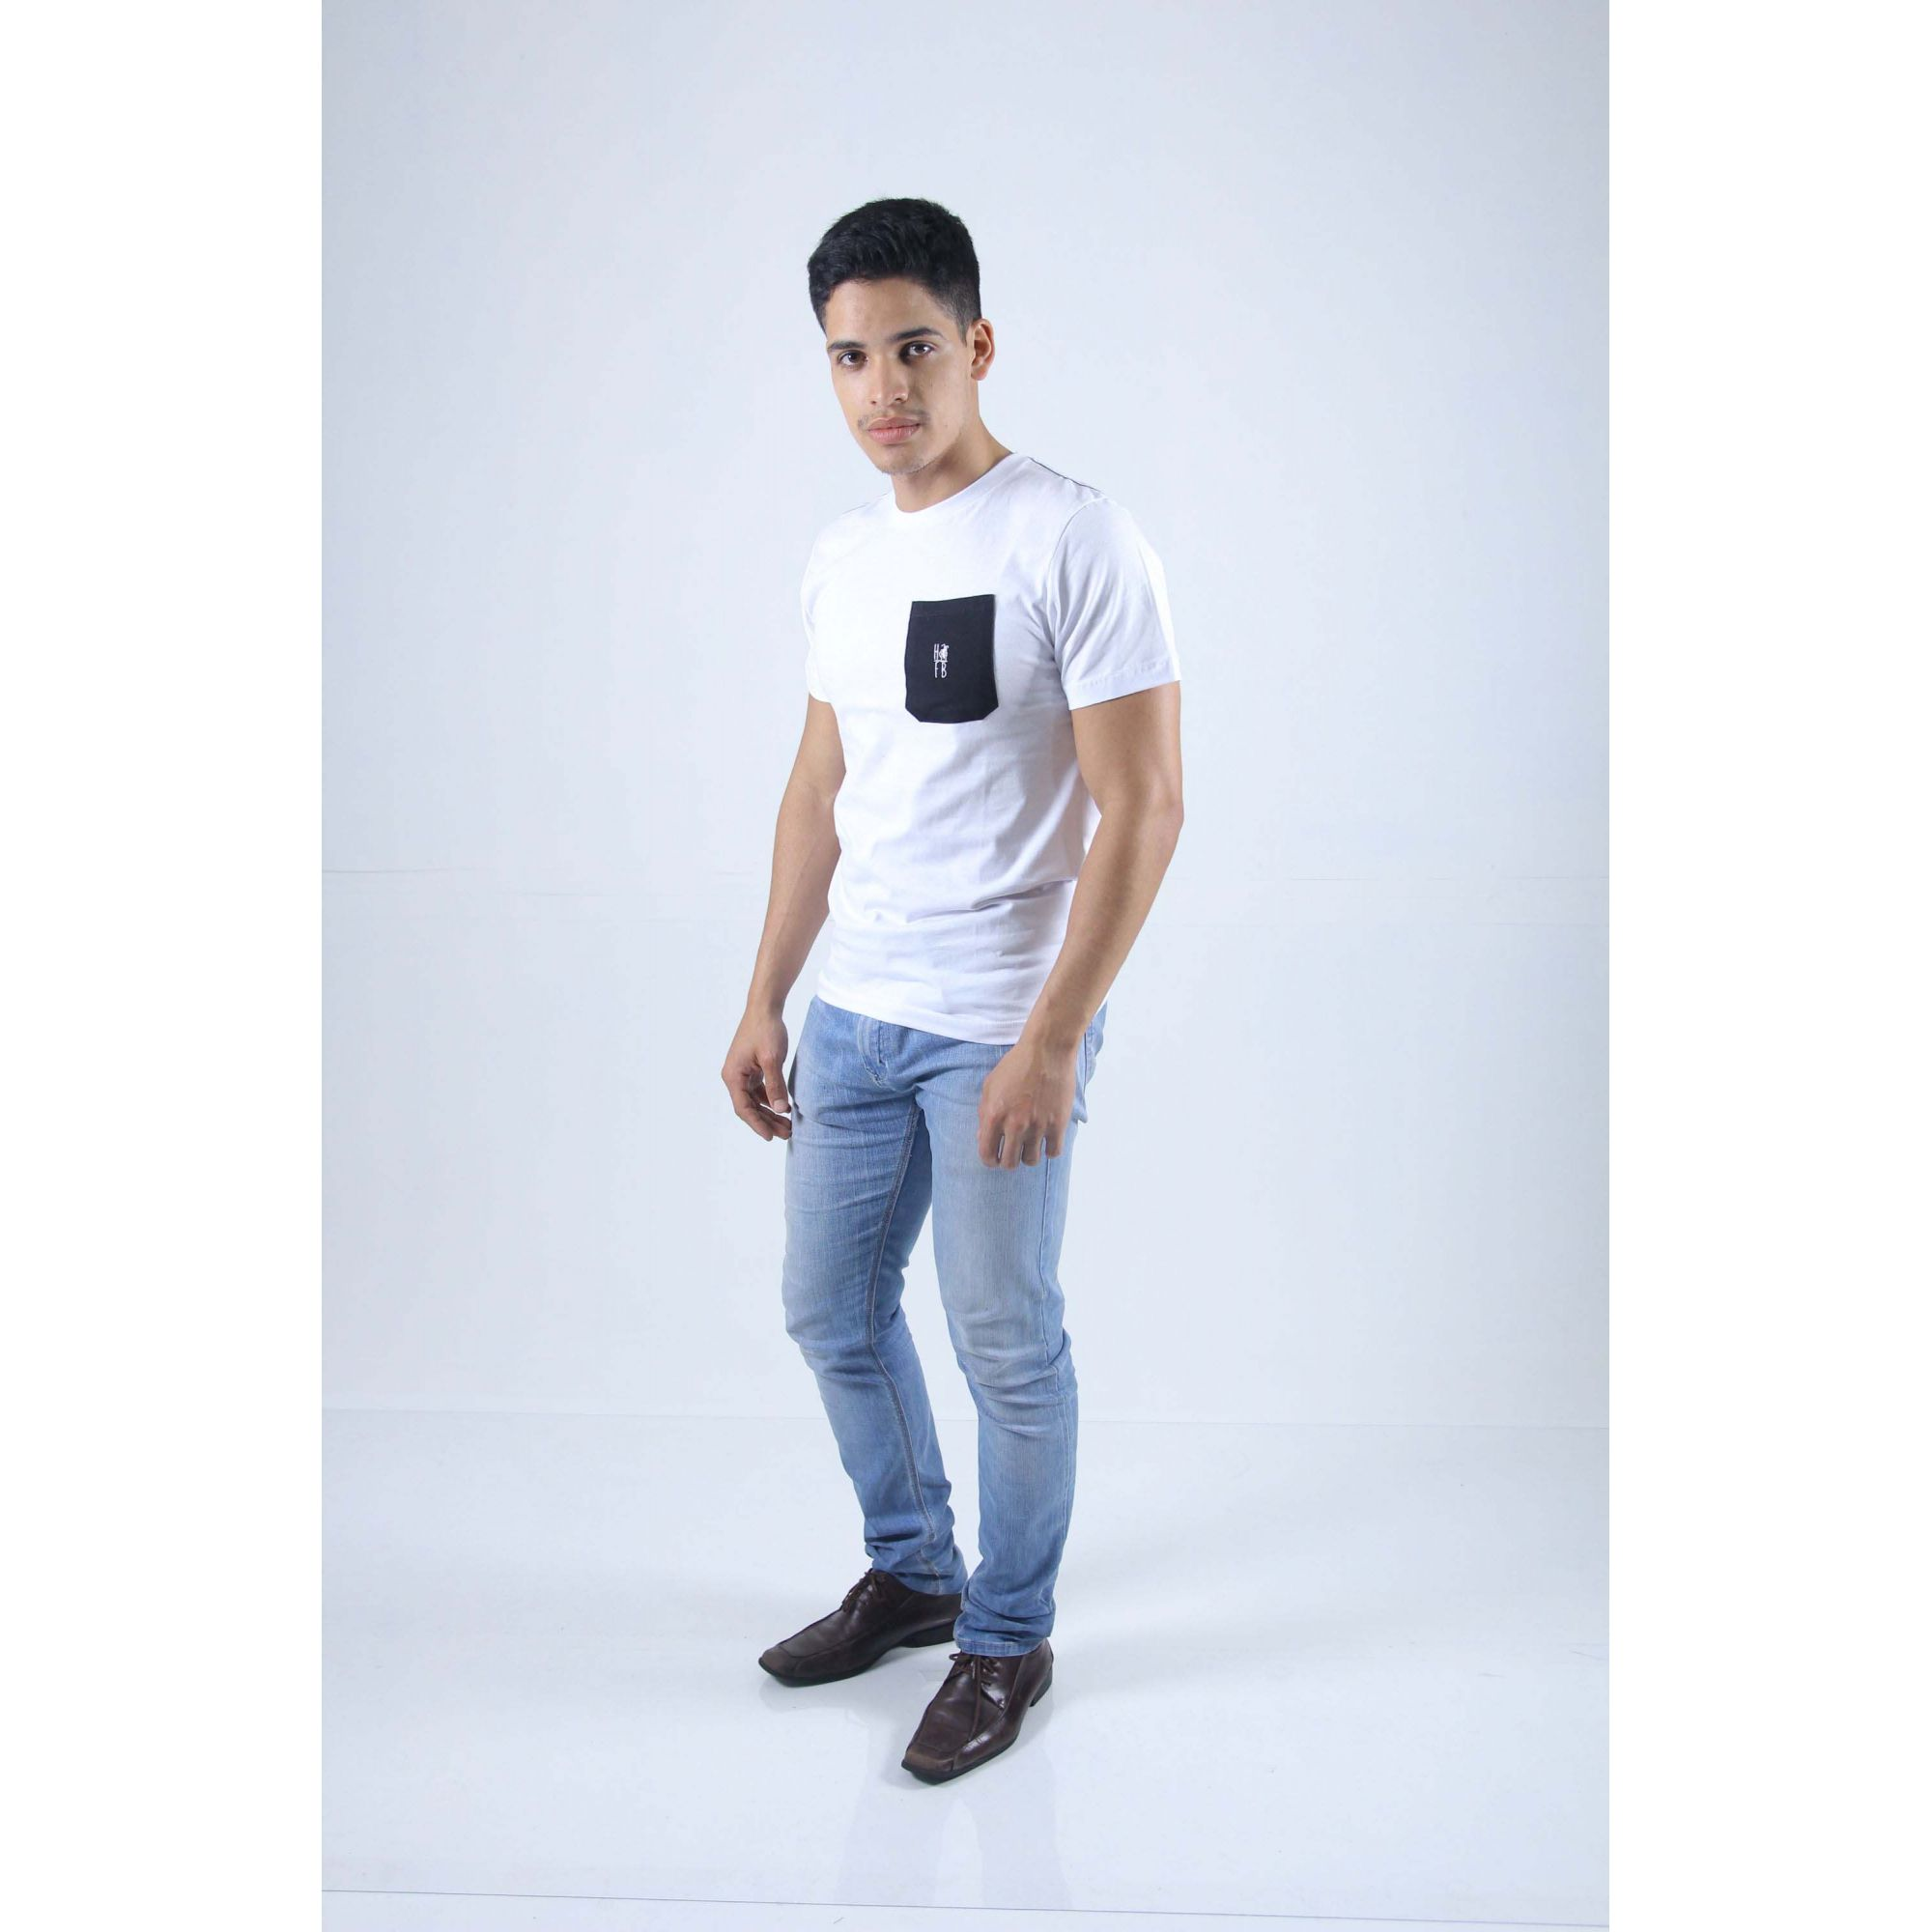 Camiseta Branca Bolso Preto  - Heitor Fashion Brazil